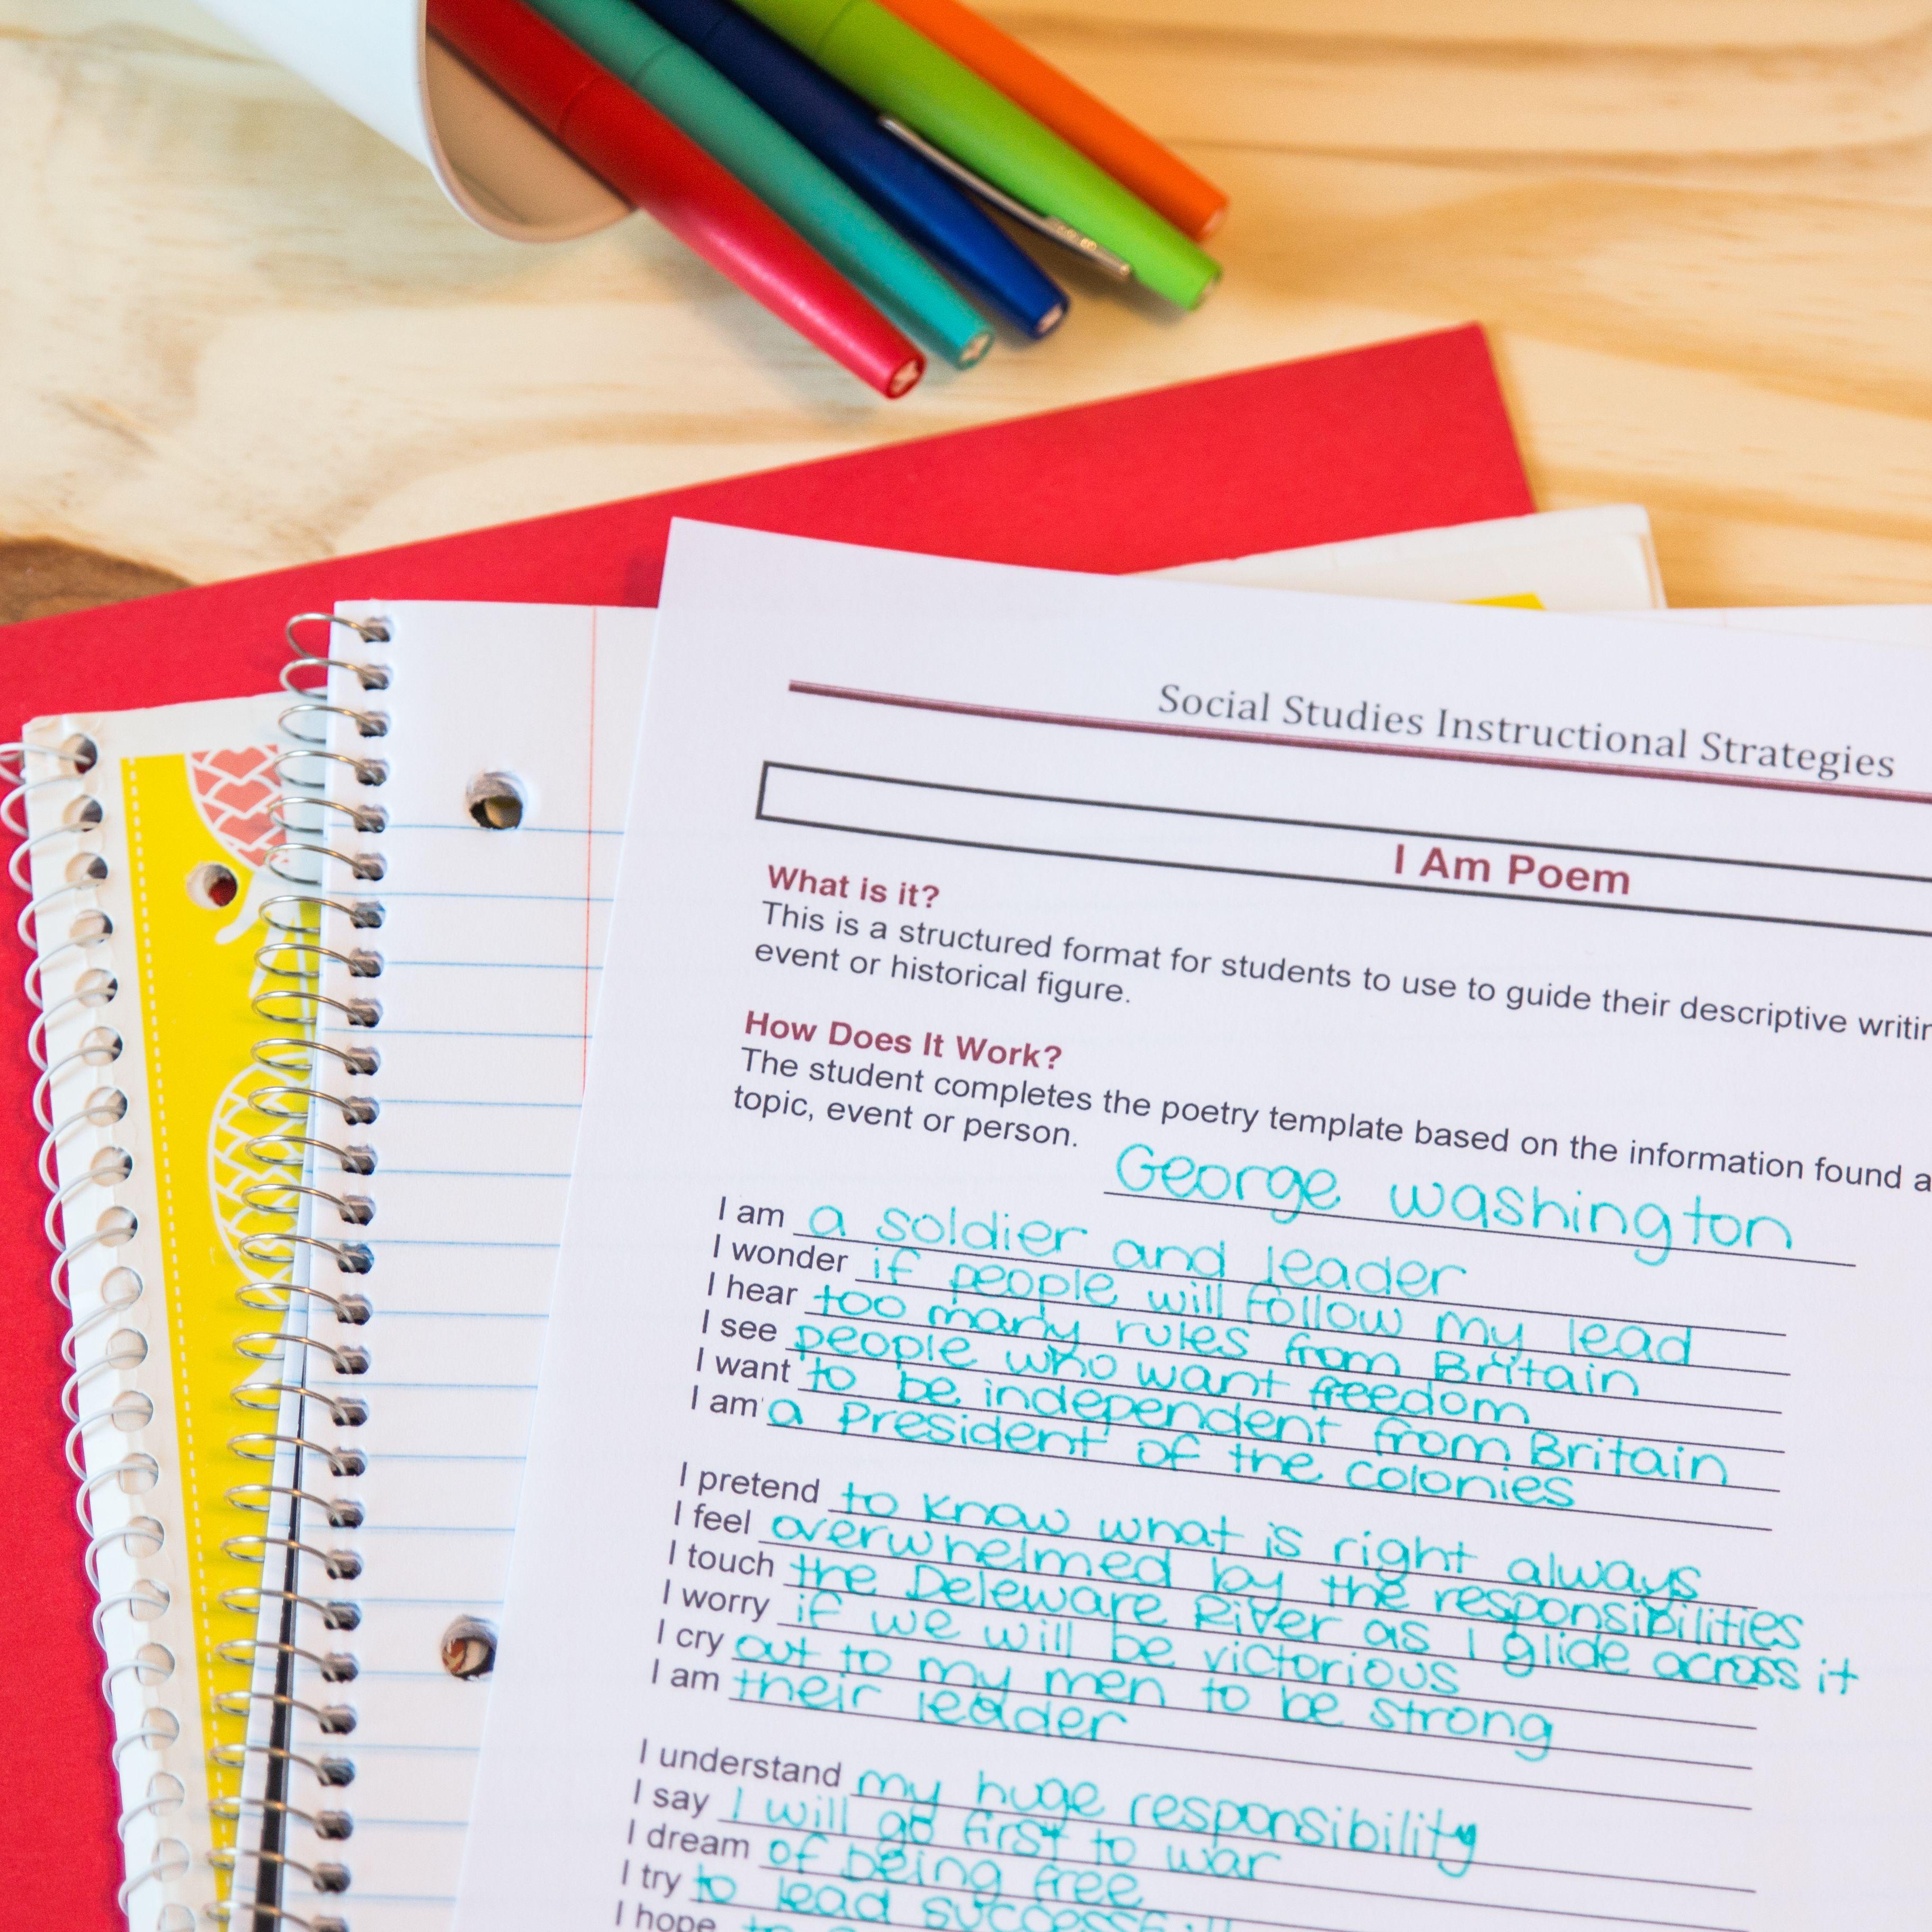 Social Studies Teaching Strategies Binder And Manual History Class